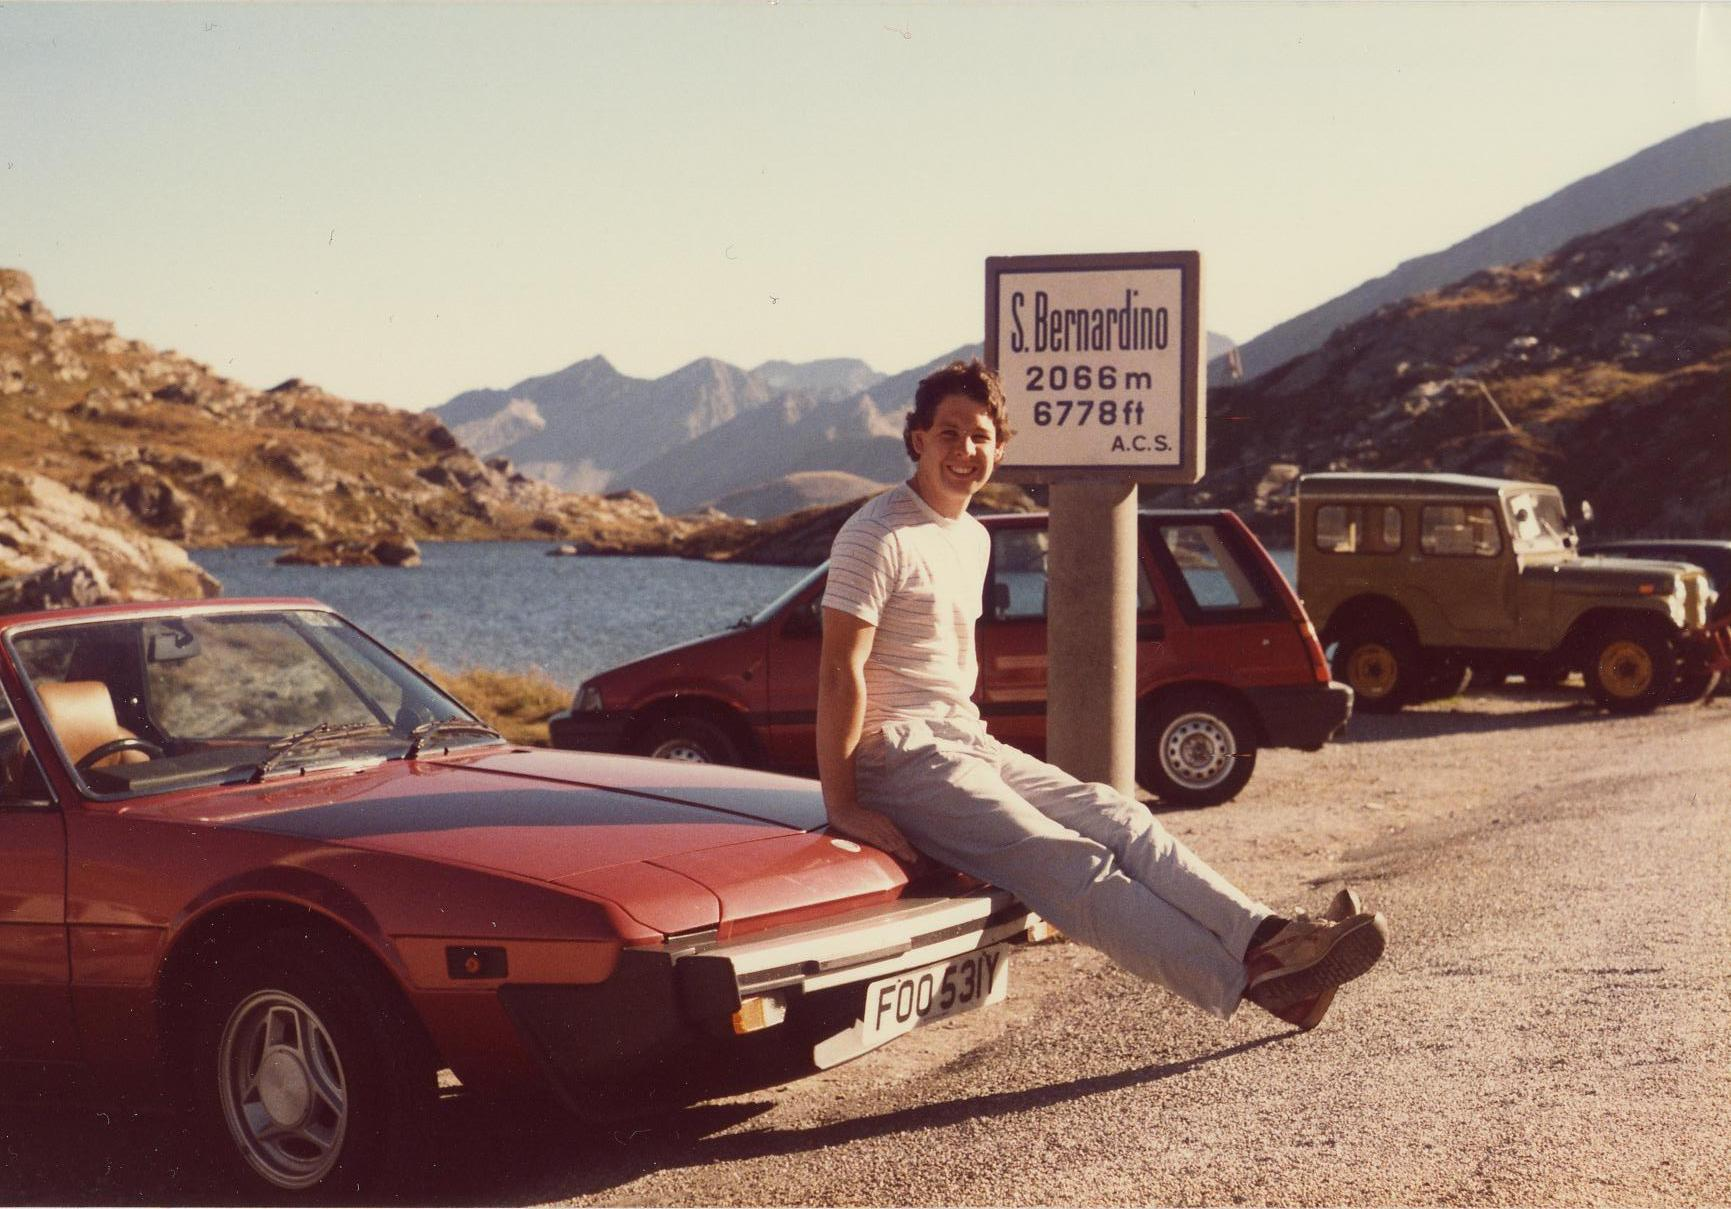 FOO531-Y-St-Bernadino-1985.jpg